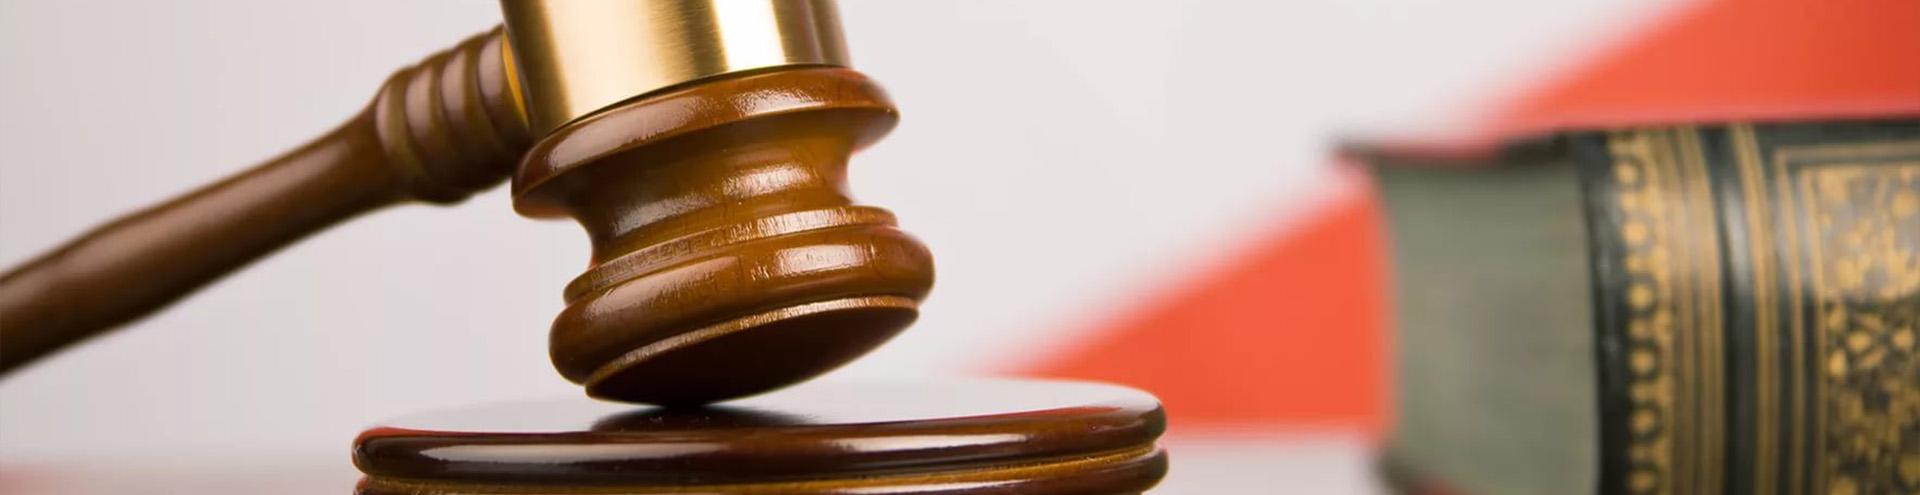 выдача судебного приказа в Уфе и Республике Башкорстан